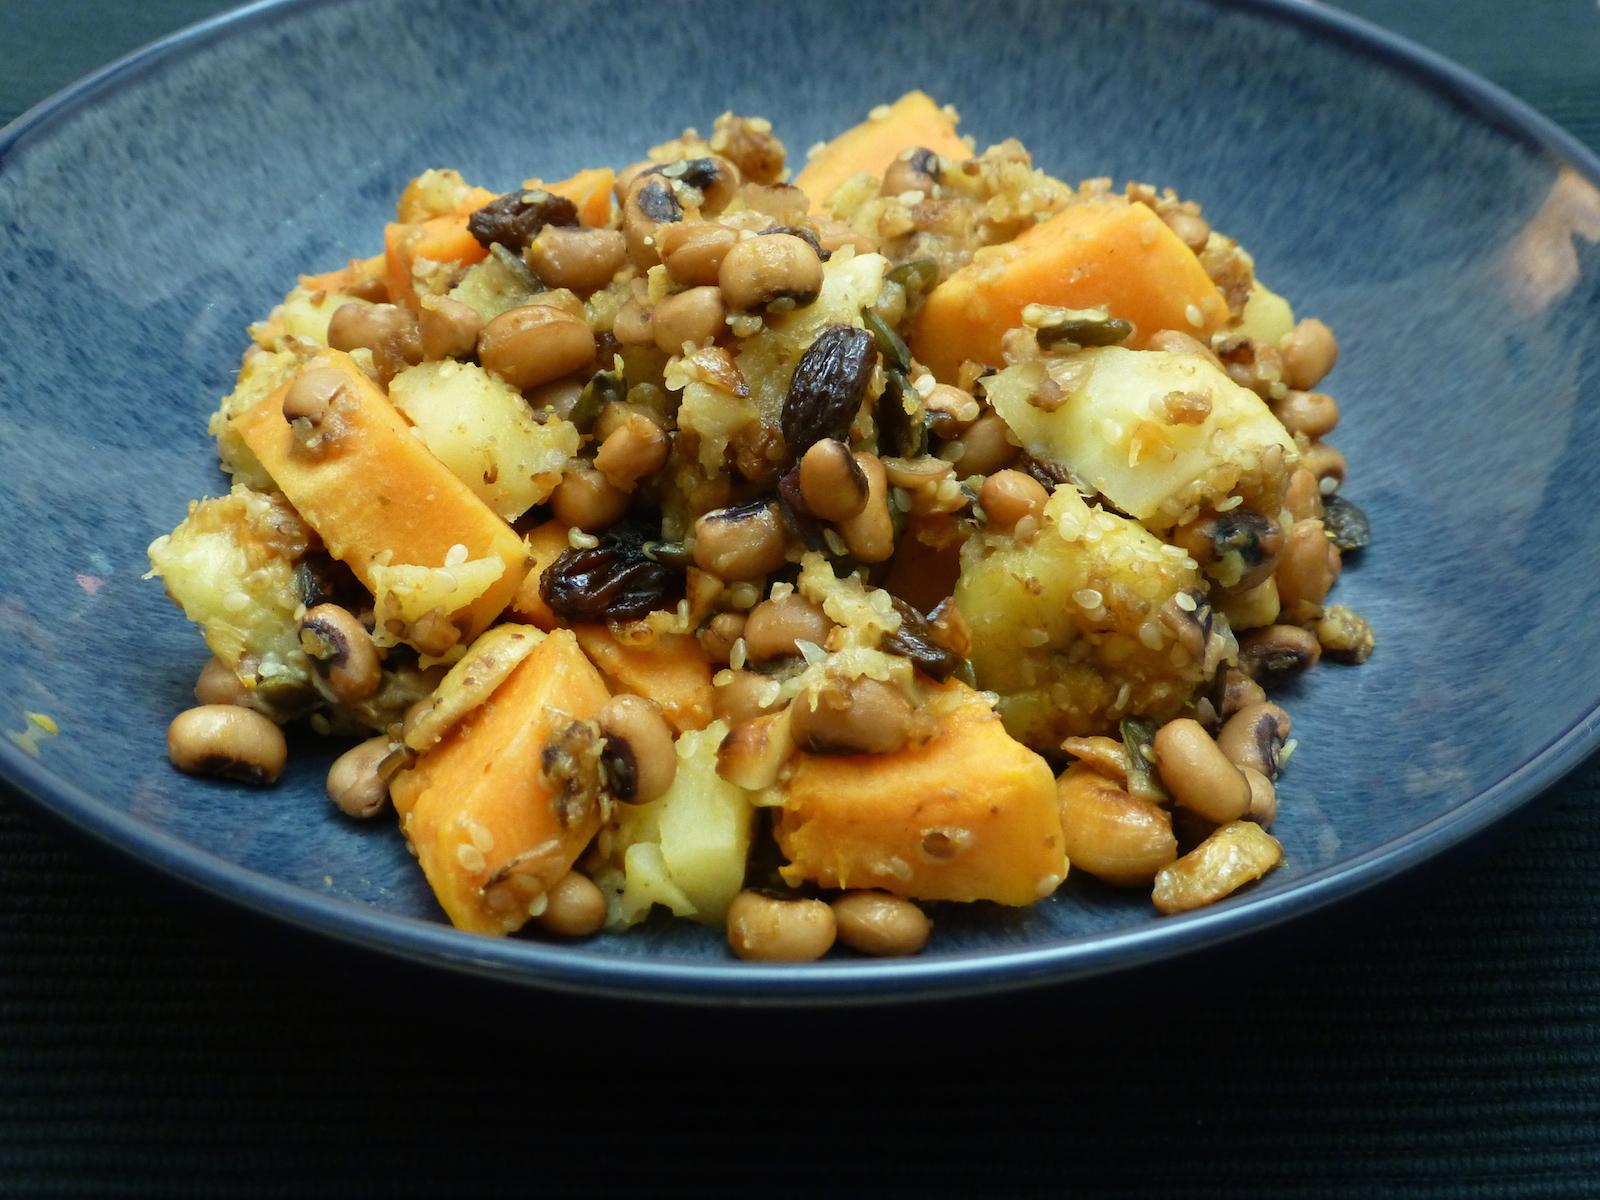 Bananas, black-eyed beans, sweet potatoes and parsnips